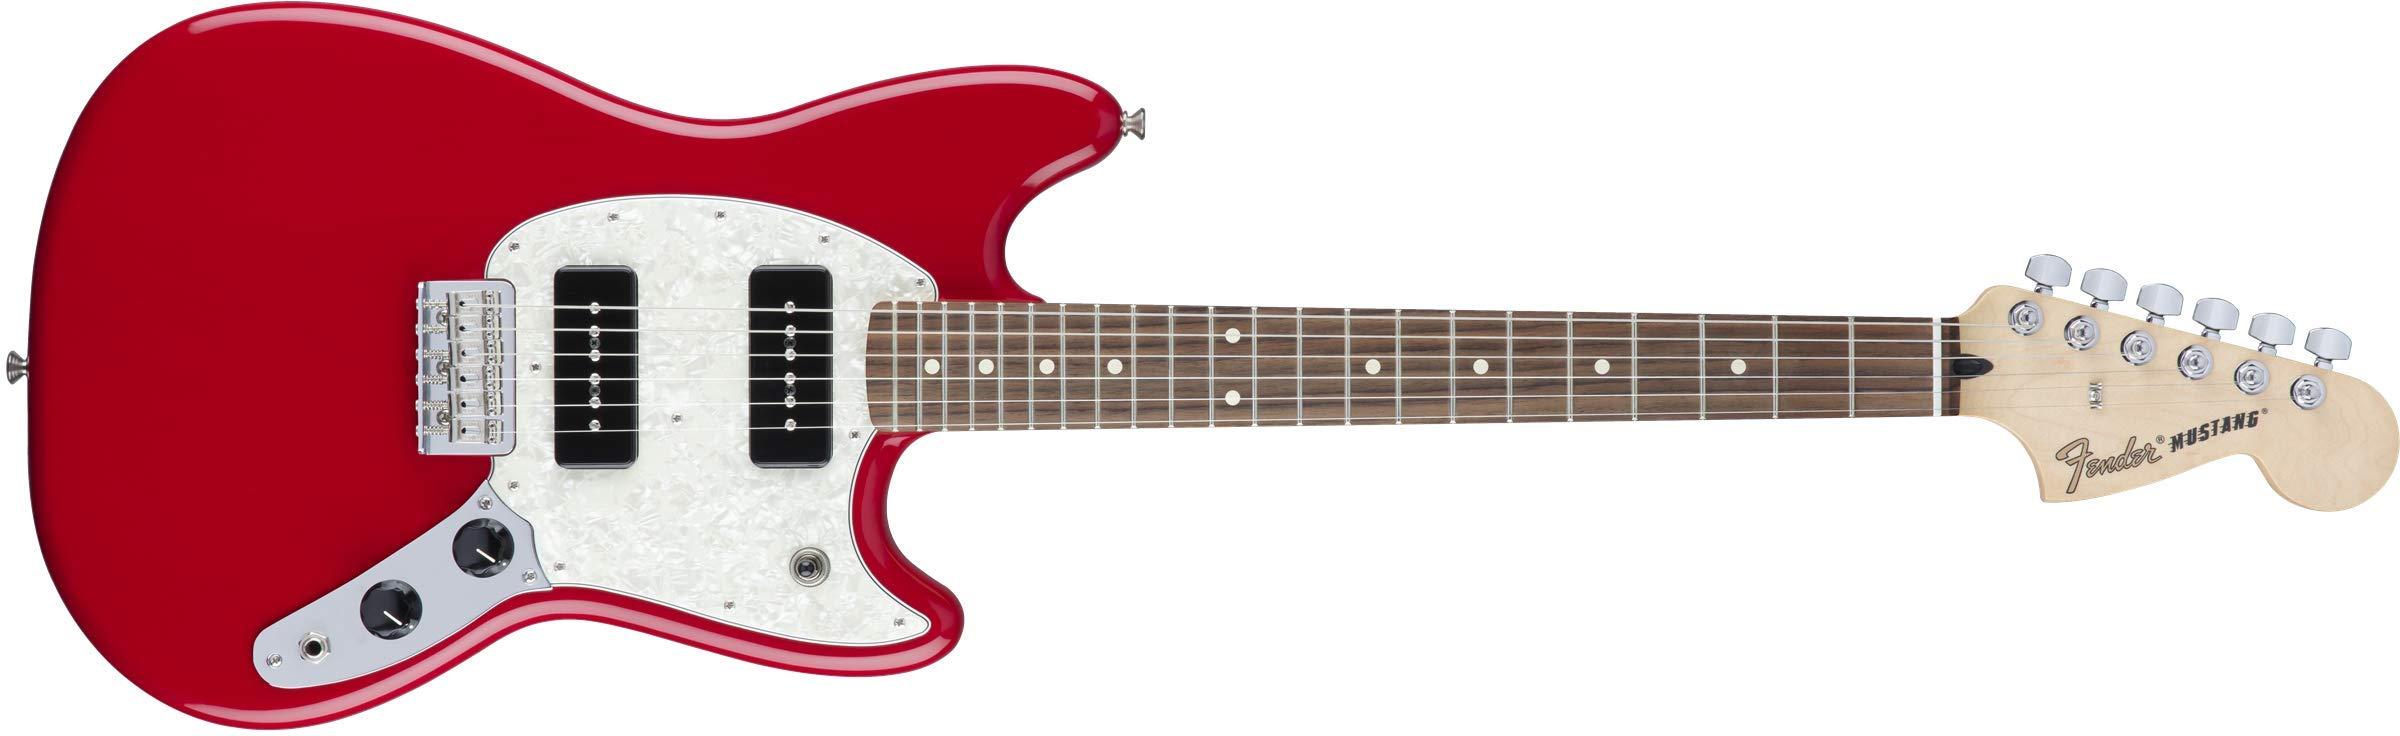 Cheap Fender Mustang 90 Short Scale Electric Guitar - Pau Ferro Fingerboard - Torino Red Black Friday & Cyber Monday 2019